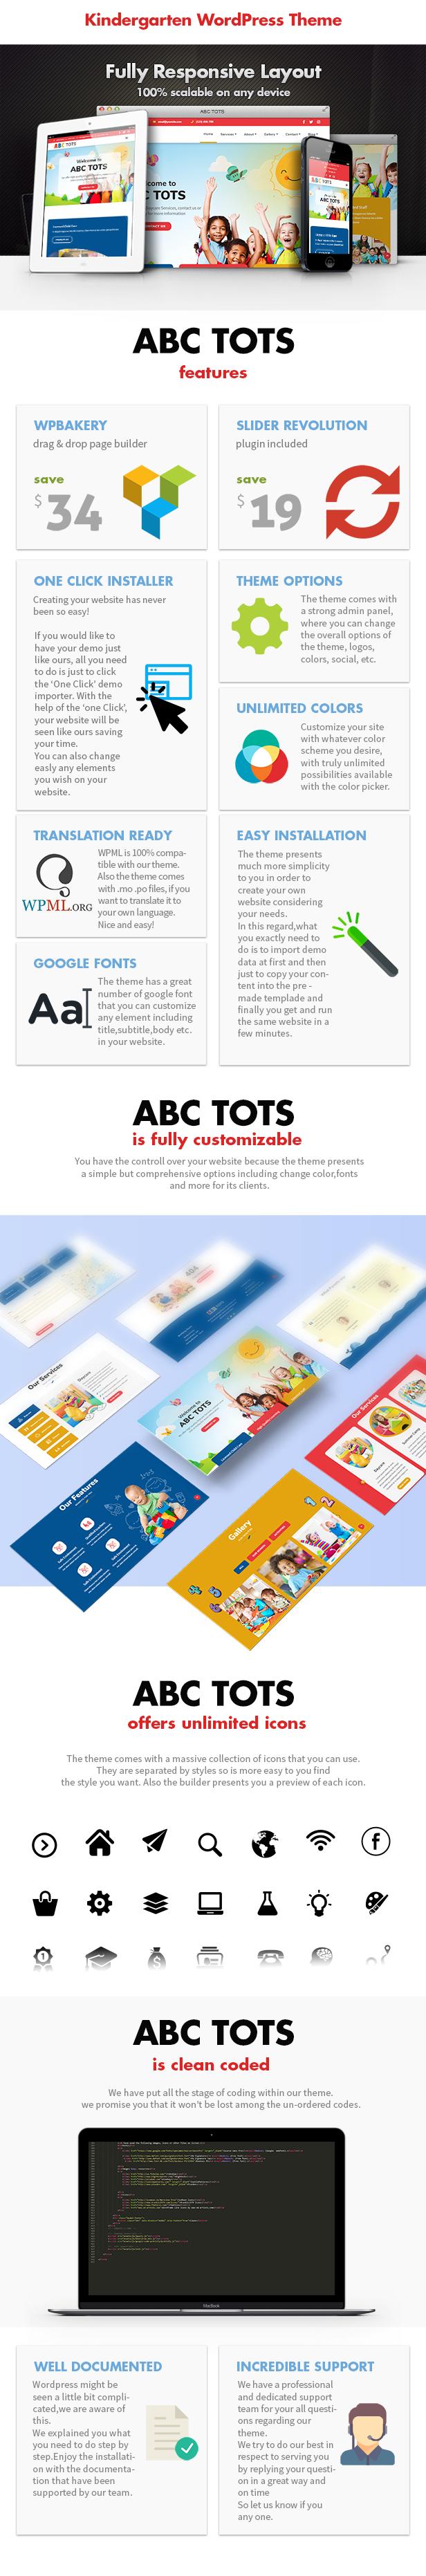 Abc Tots - Kindergarten WordPress Theme - 3